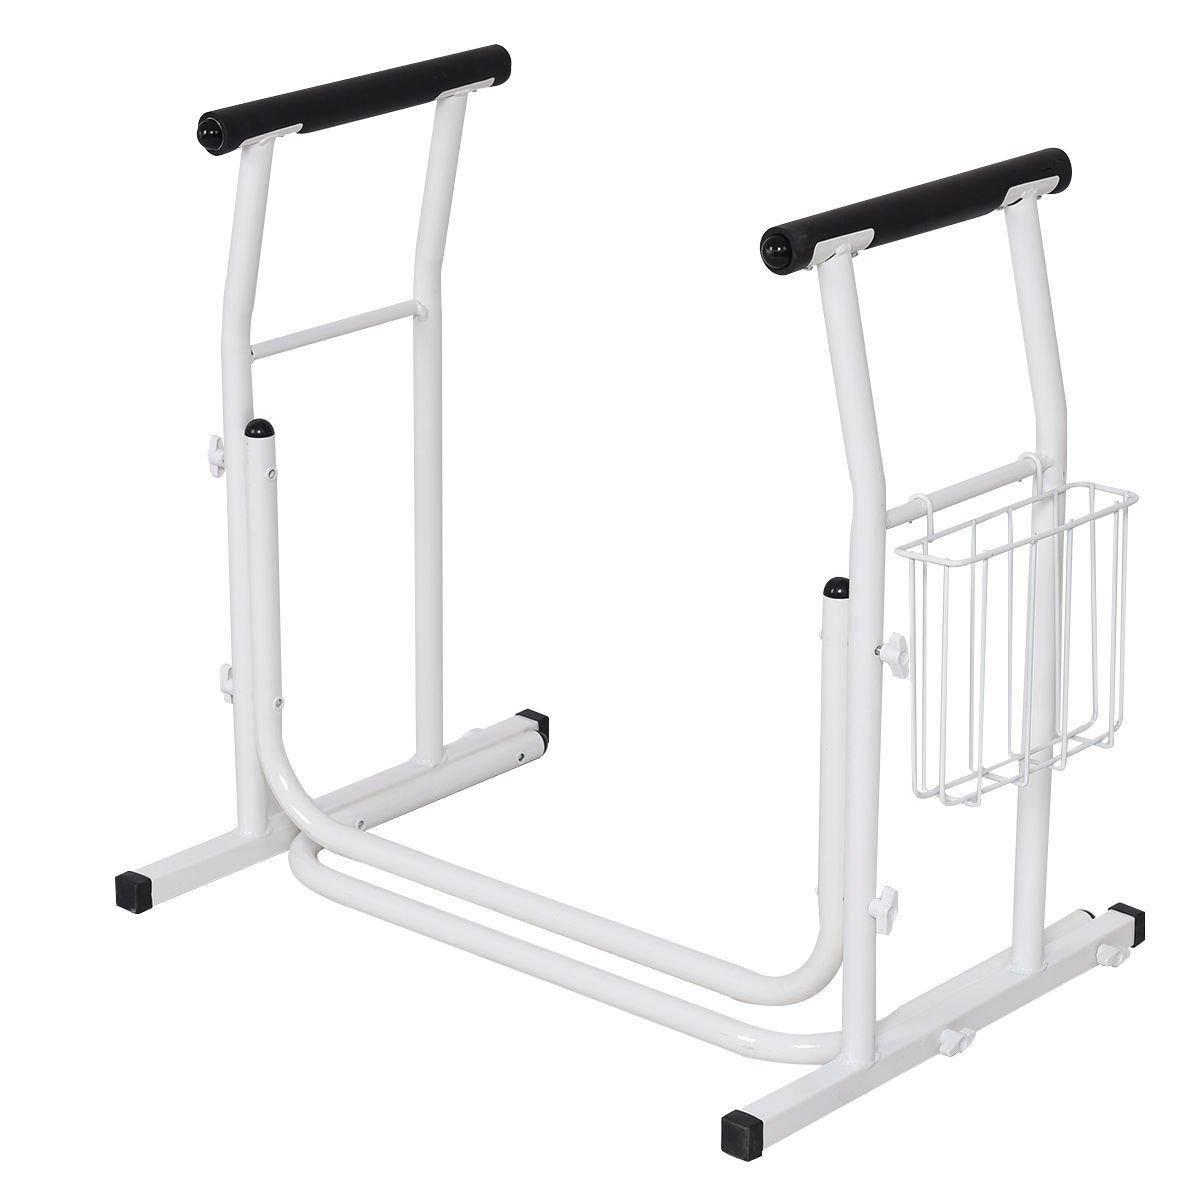 White Steel Toilet Safety Rail Medical Freestanding Stand Padded Armres w/Magazine Rack